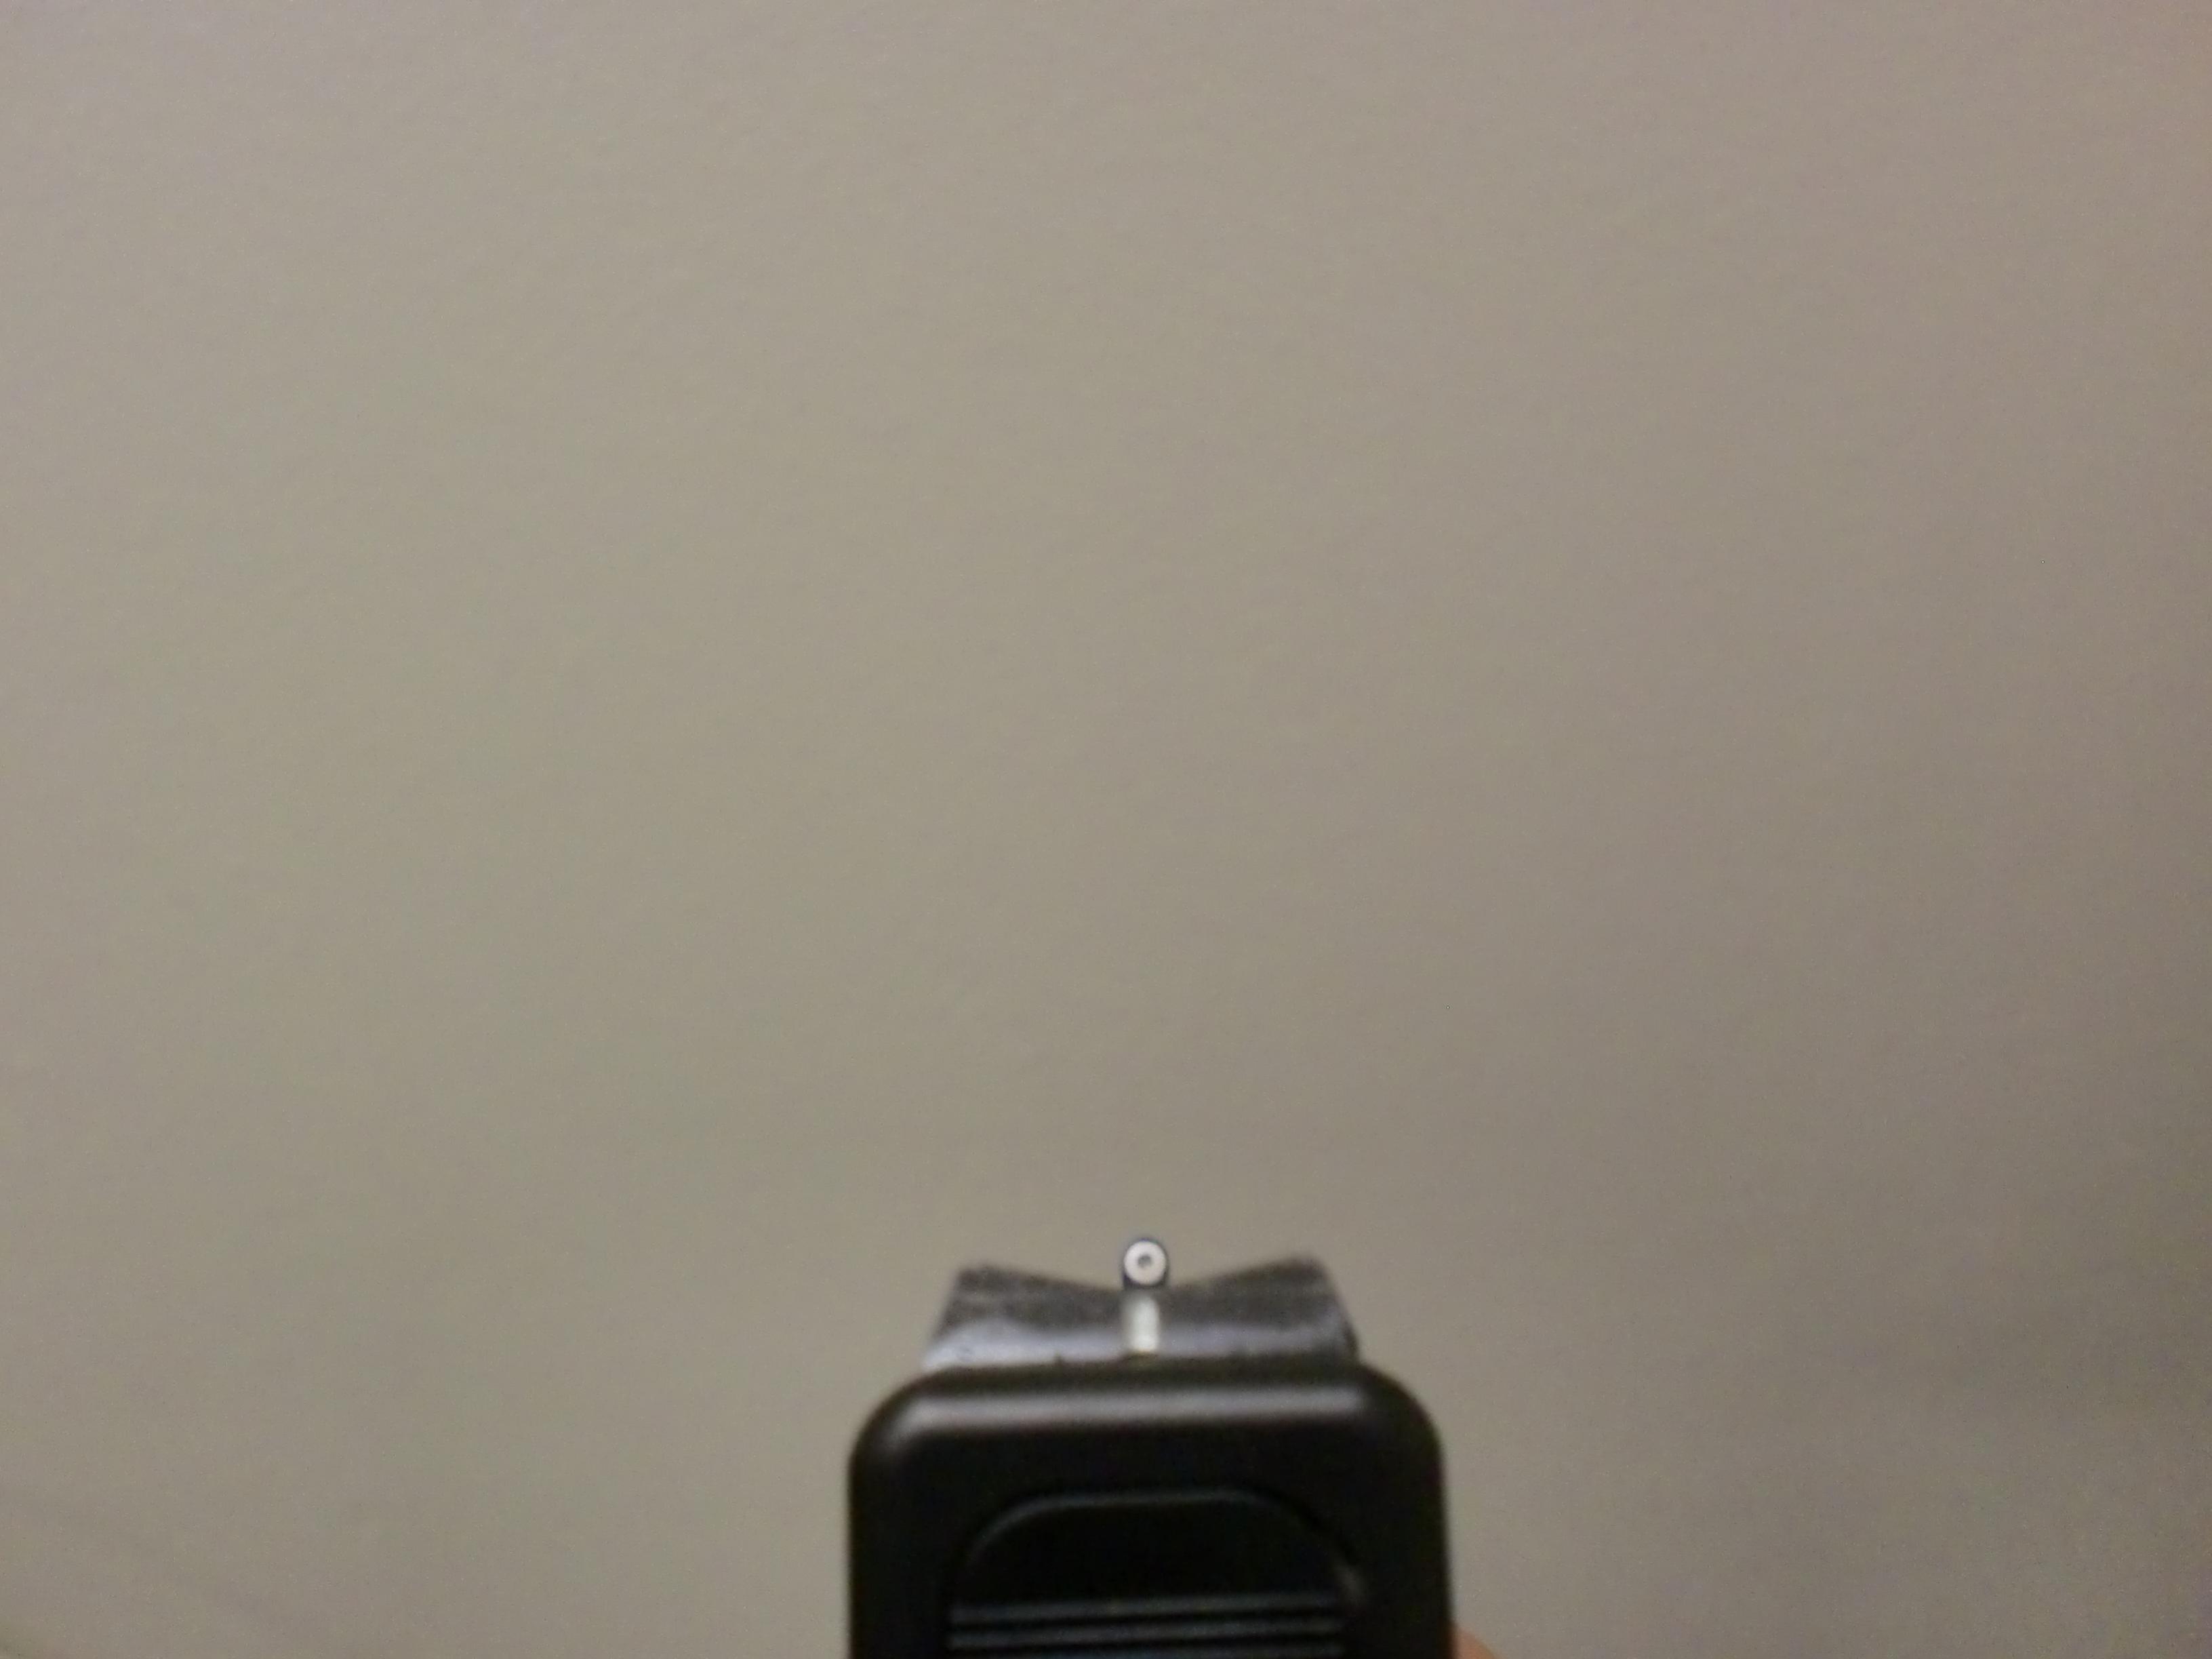 New XS Sights on Glock & LCR PICS-cimg0763.jpg